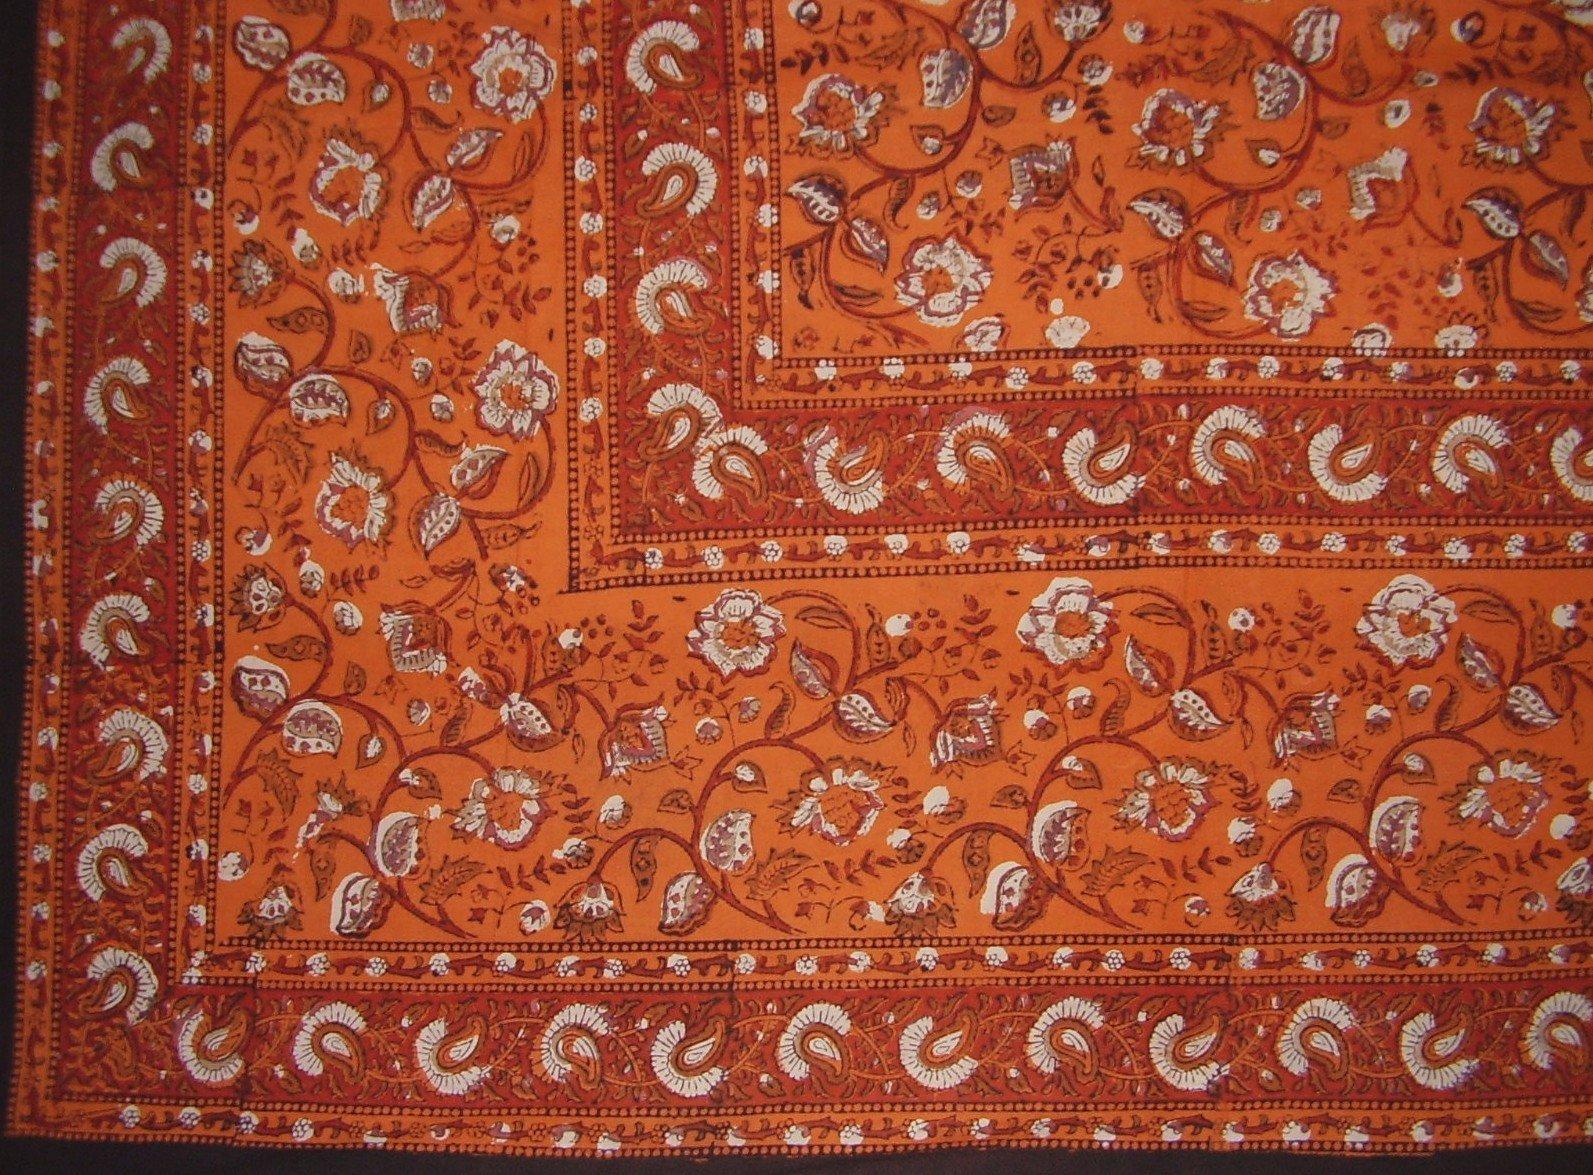 Earth Dabu Block Print Indian Tapestry Cotton Spread 106'' x 88'' Full Orange